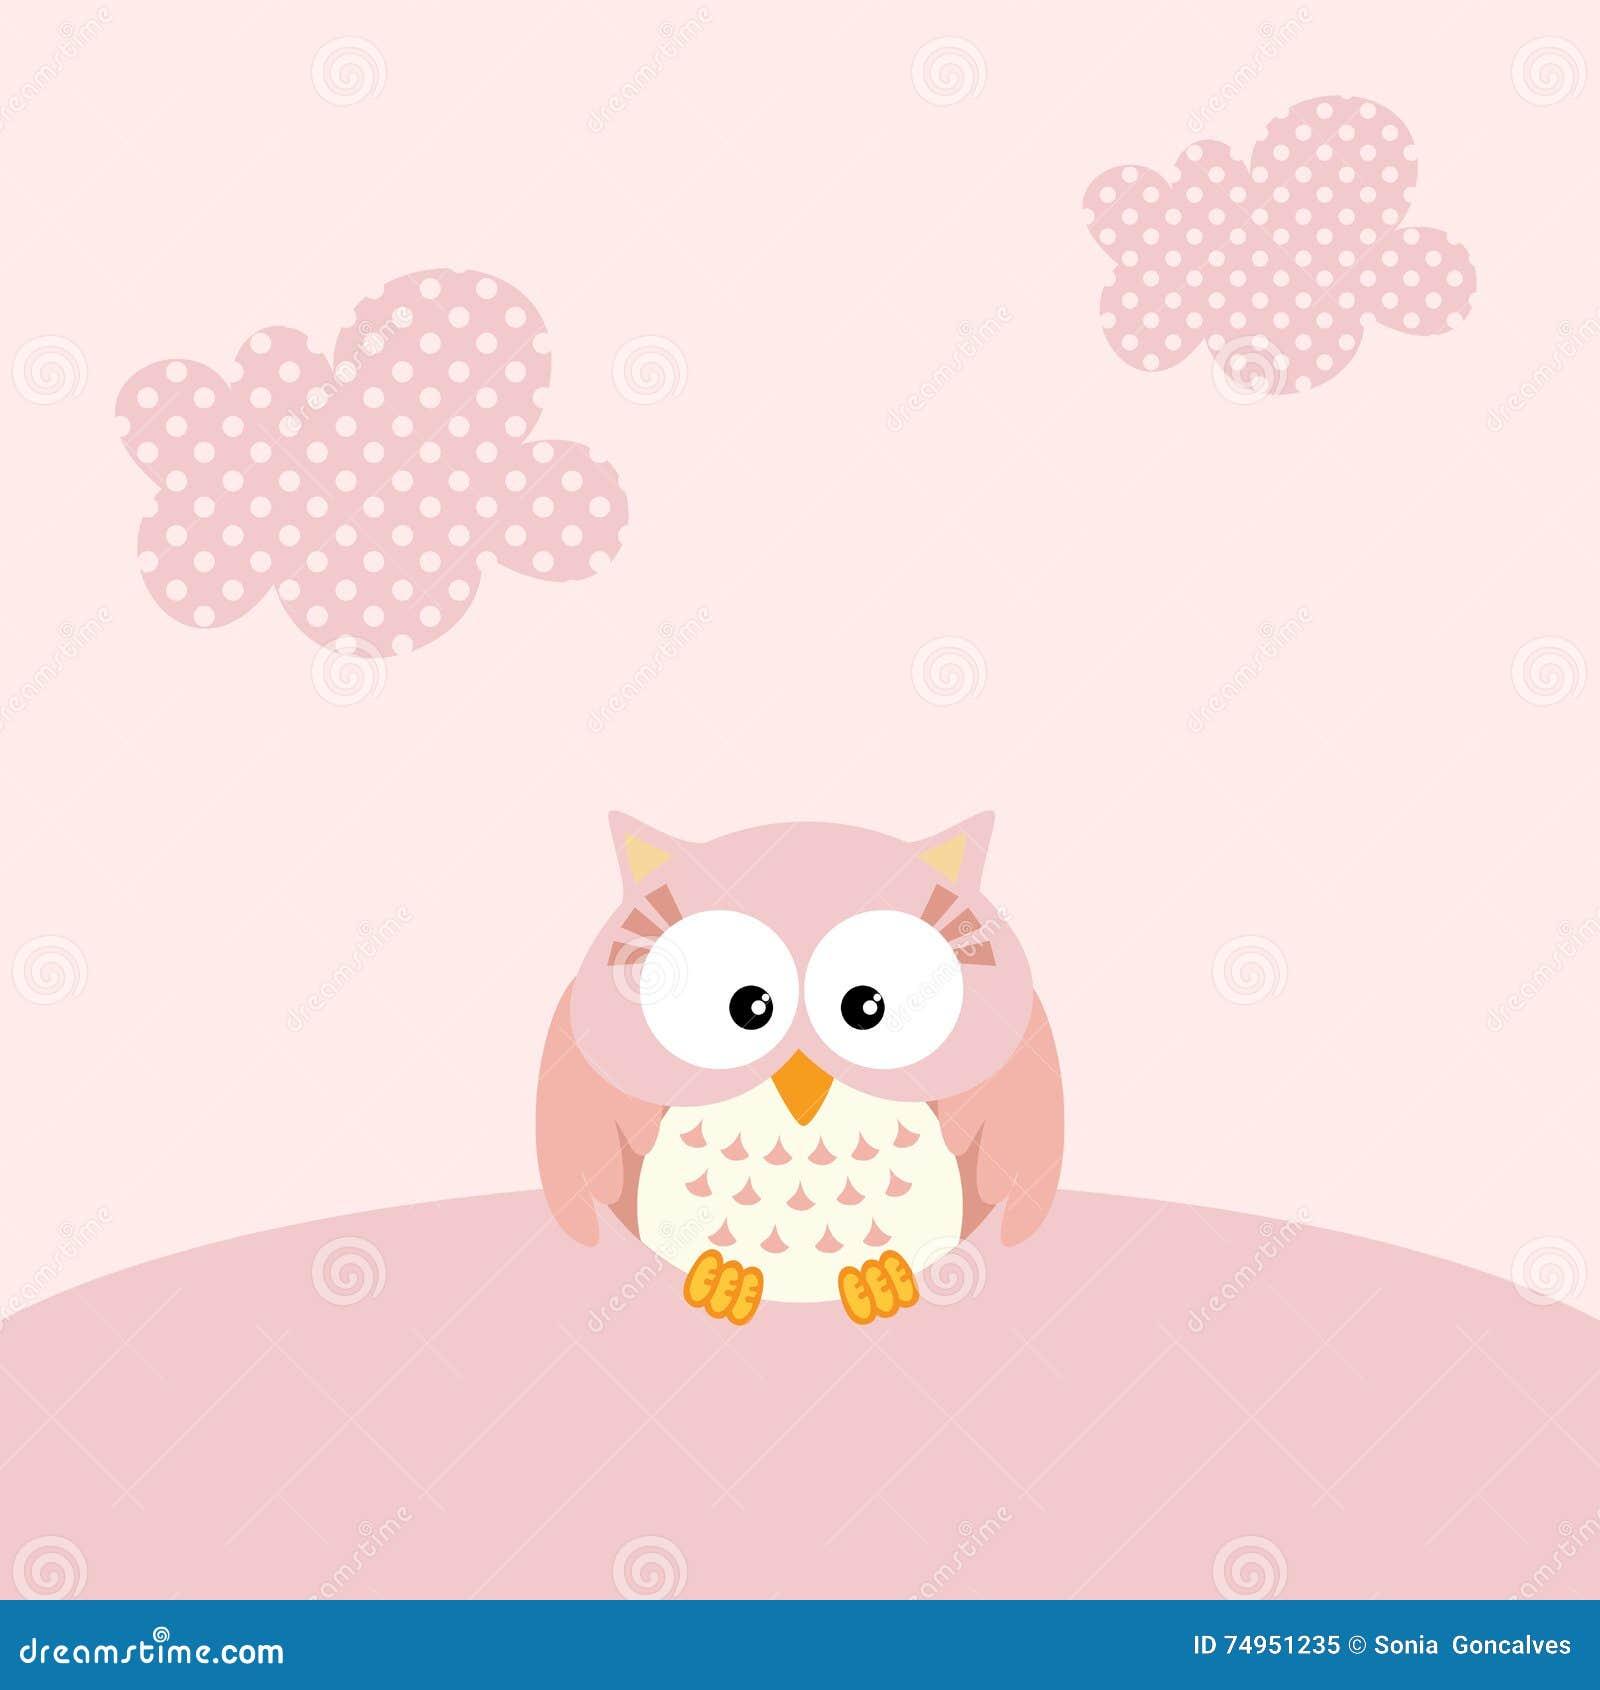 Baby girl owl background stock vector. Image of happy ...